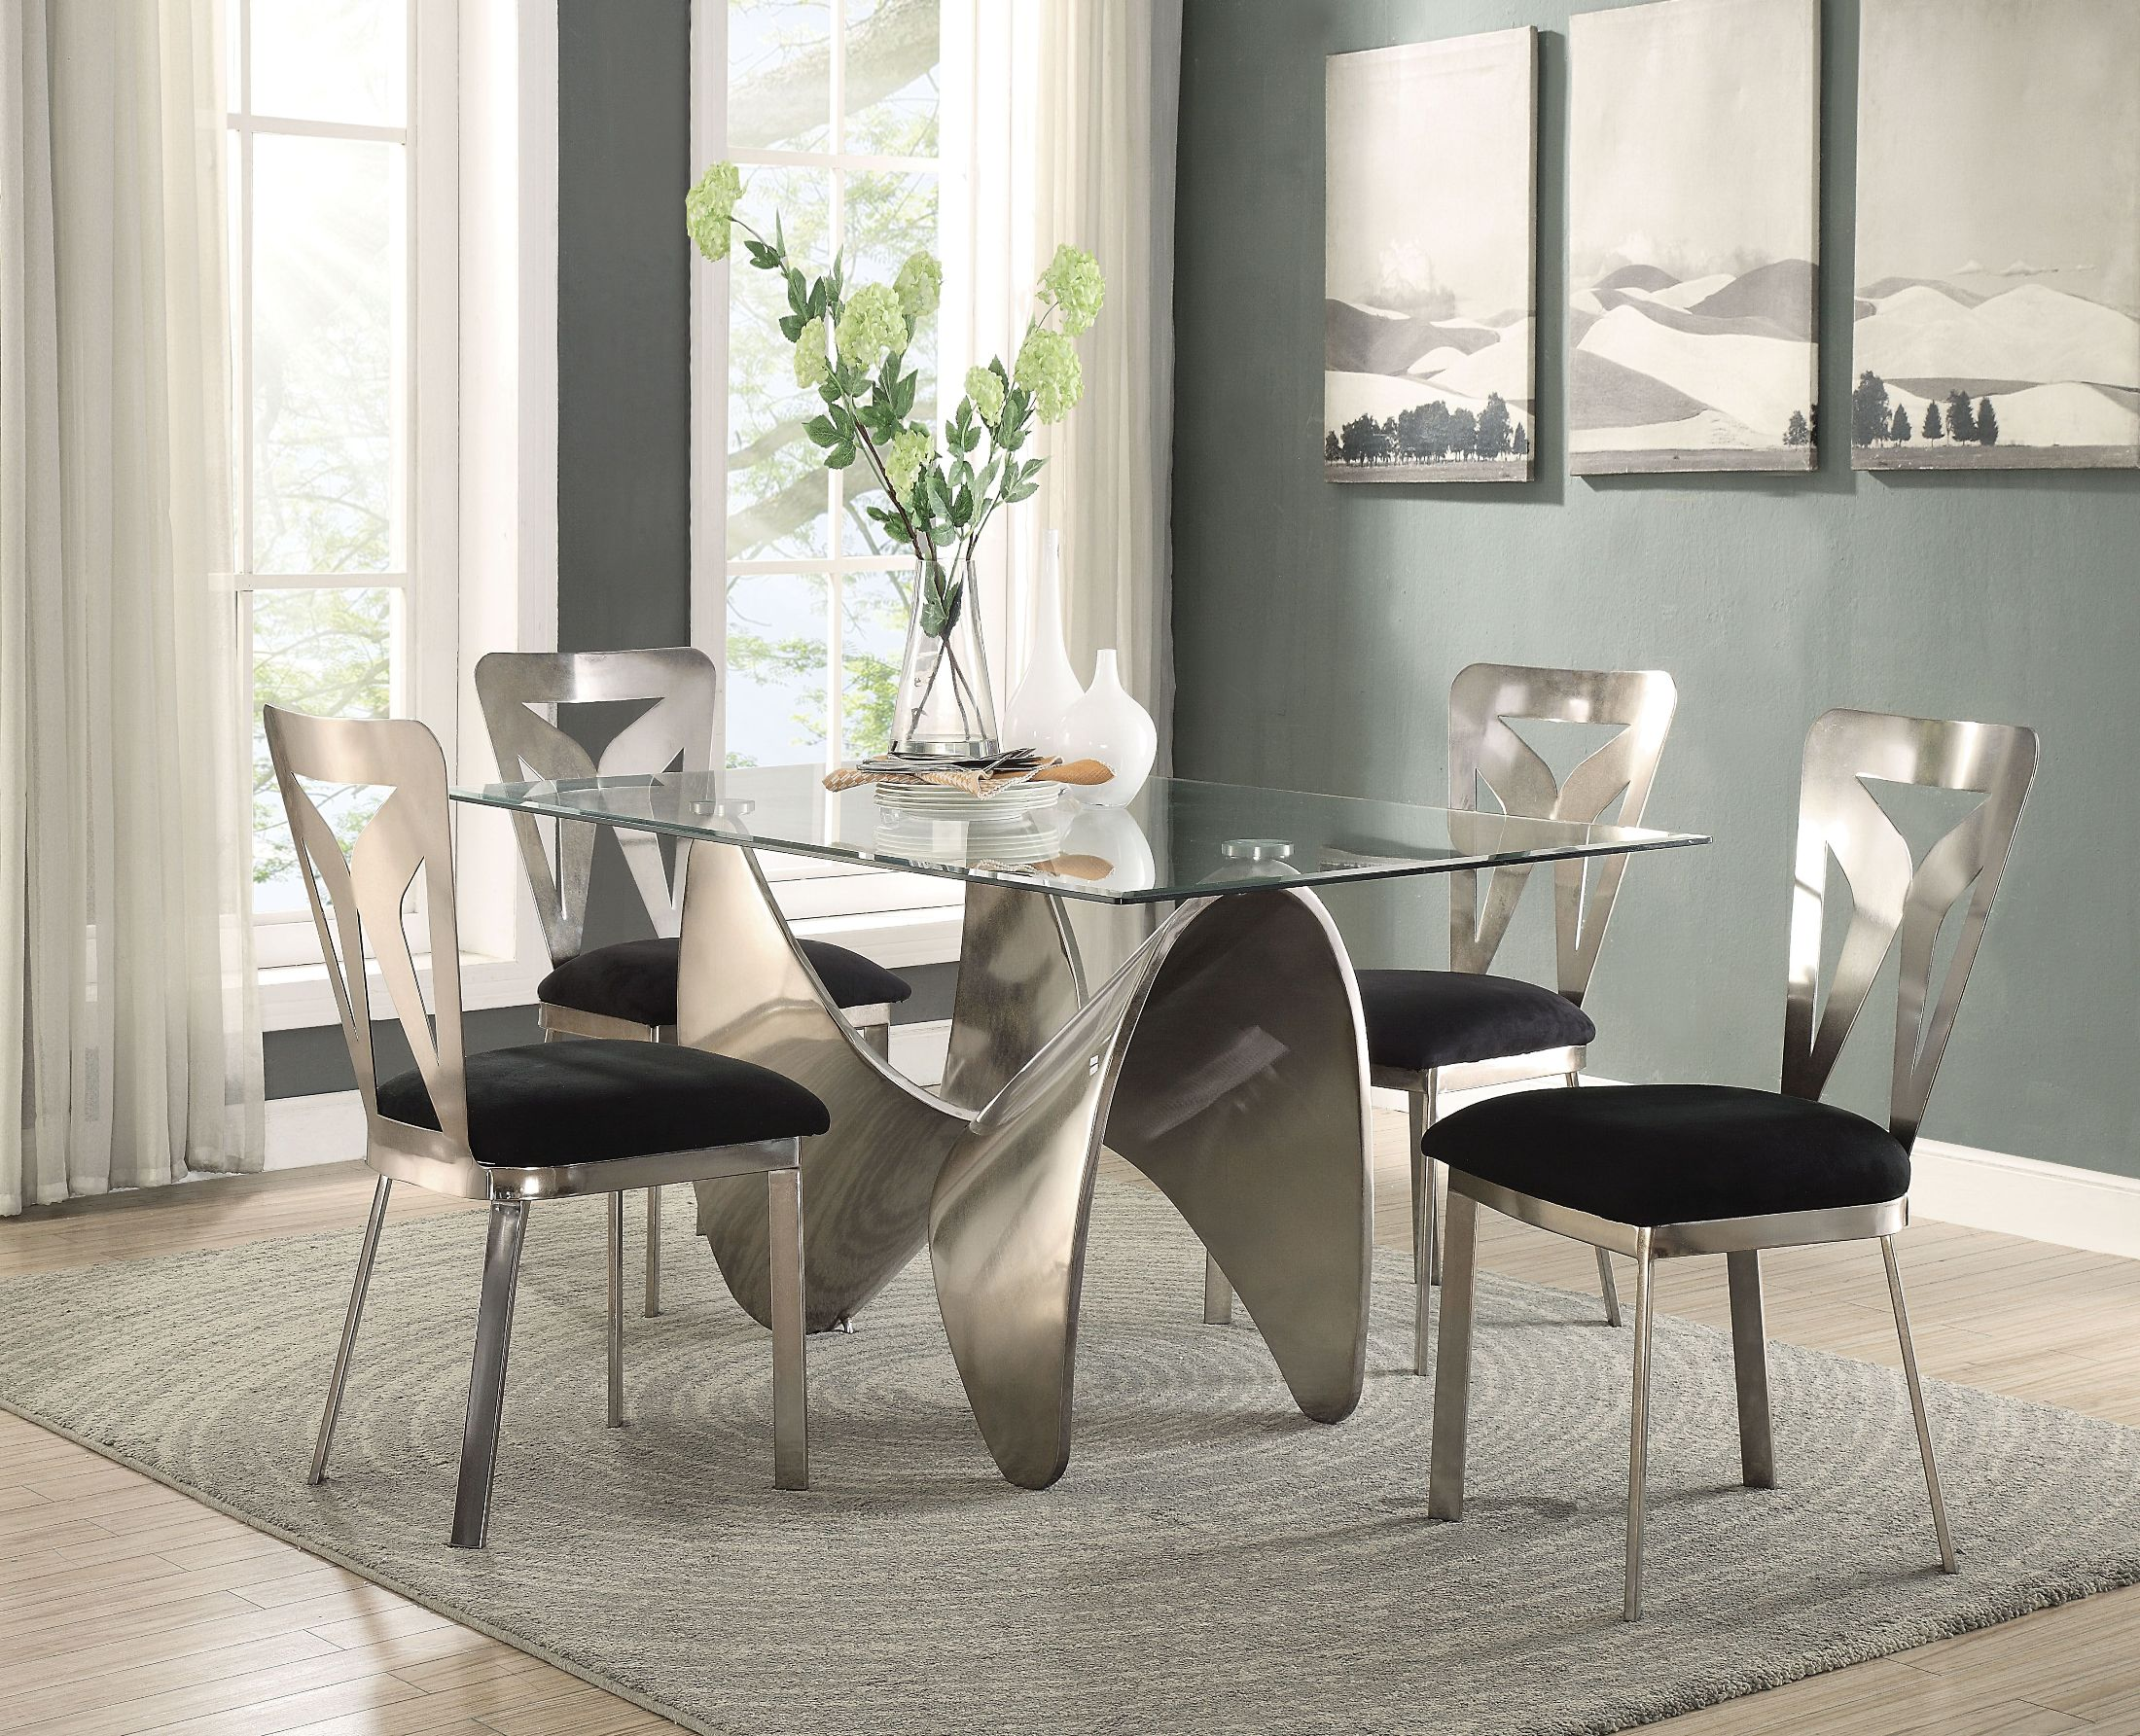 ACME Widforss Antique Silver Dining Room Set  Widforss